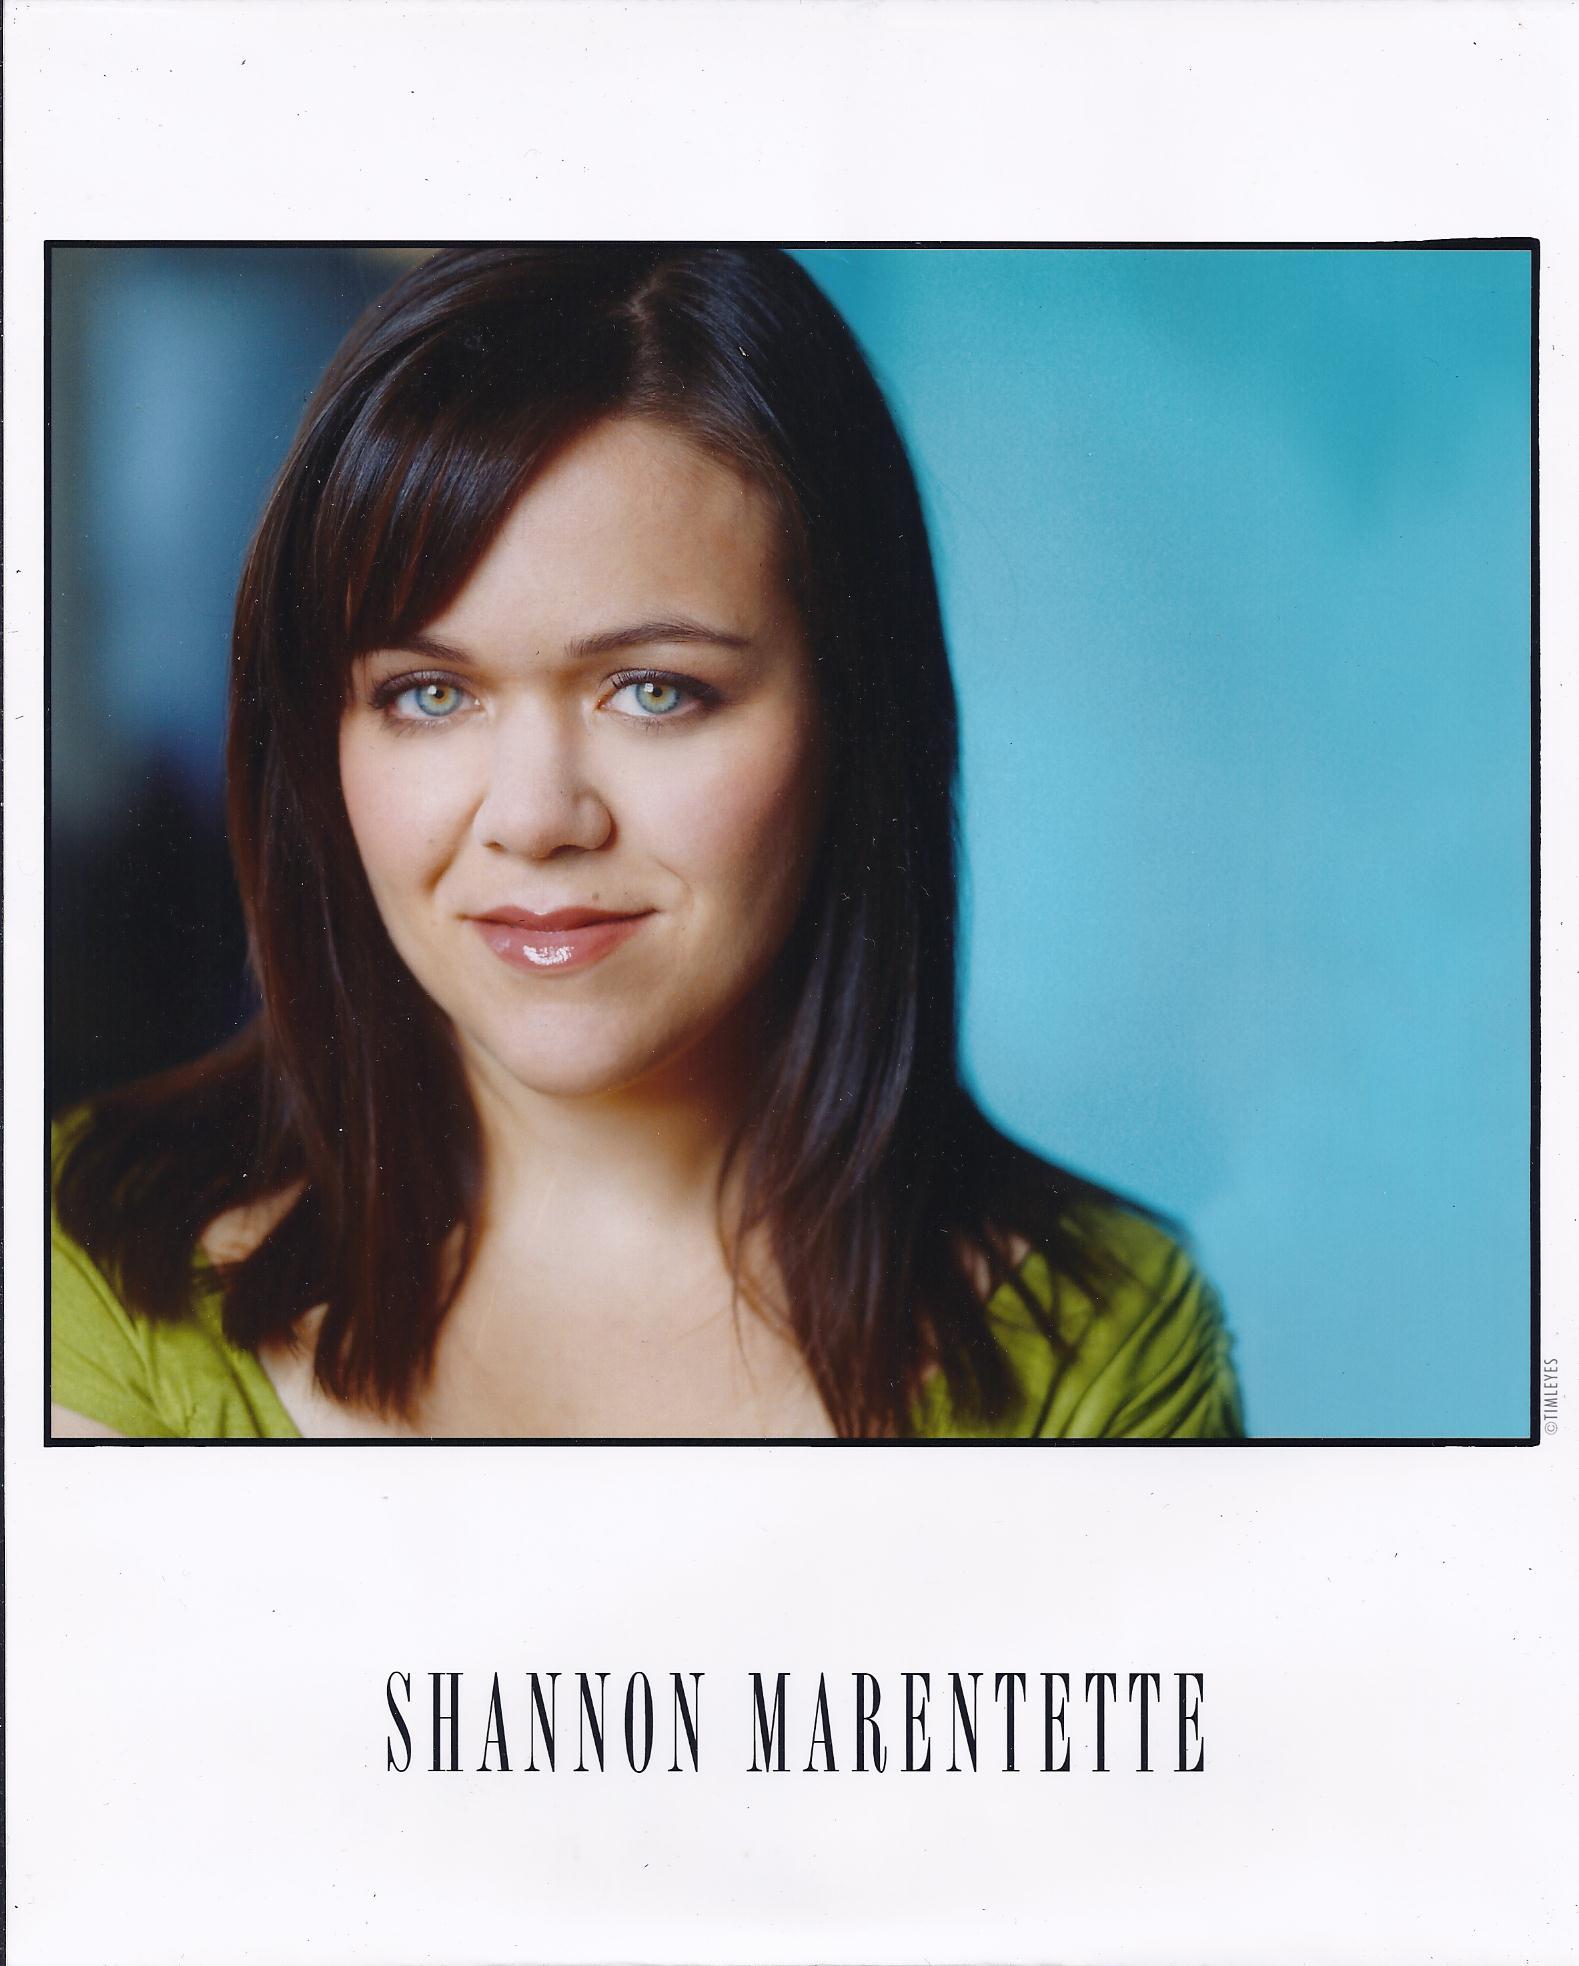 Shannon Marentette